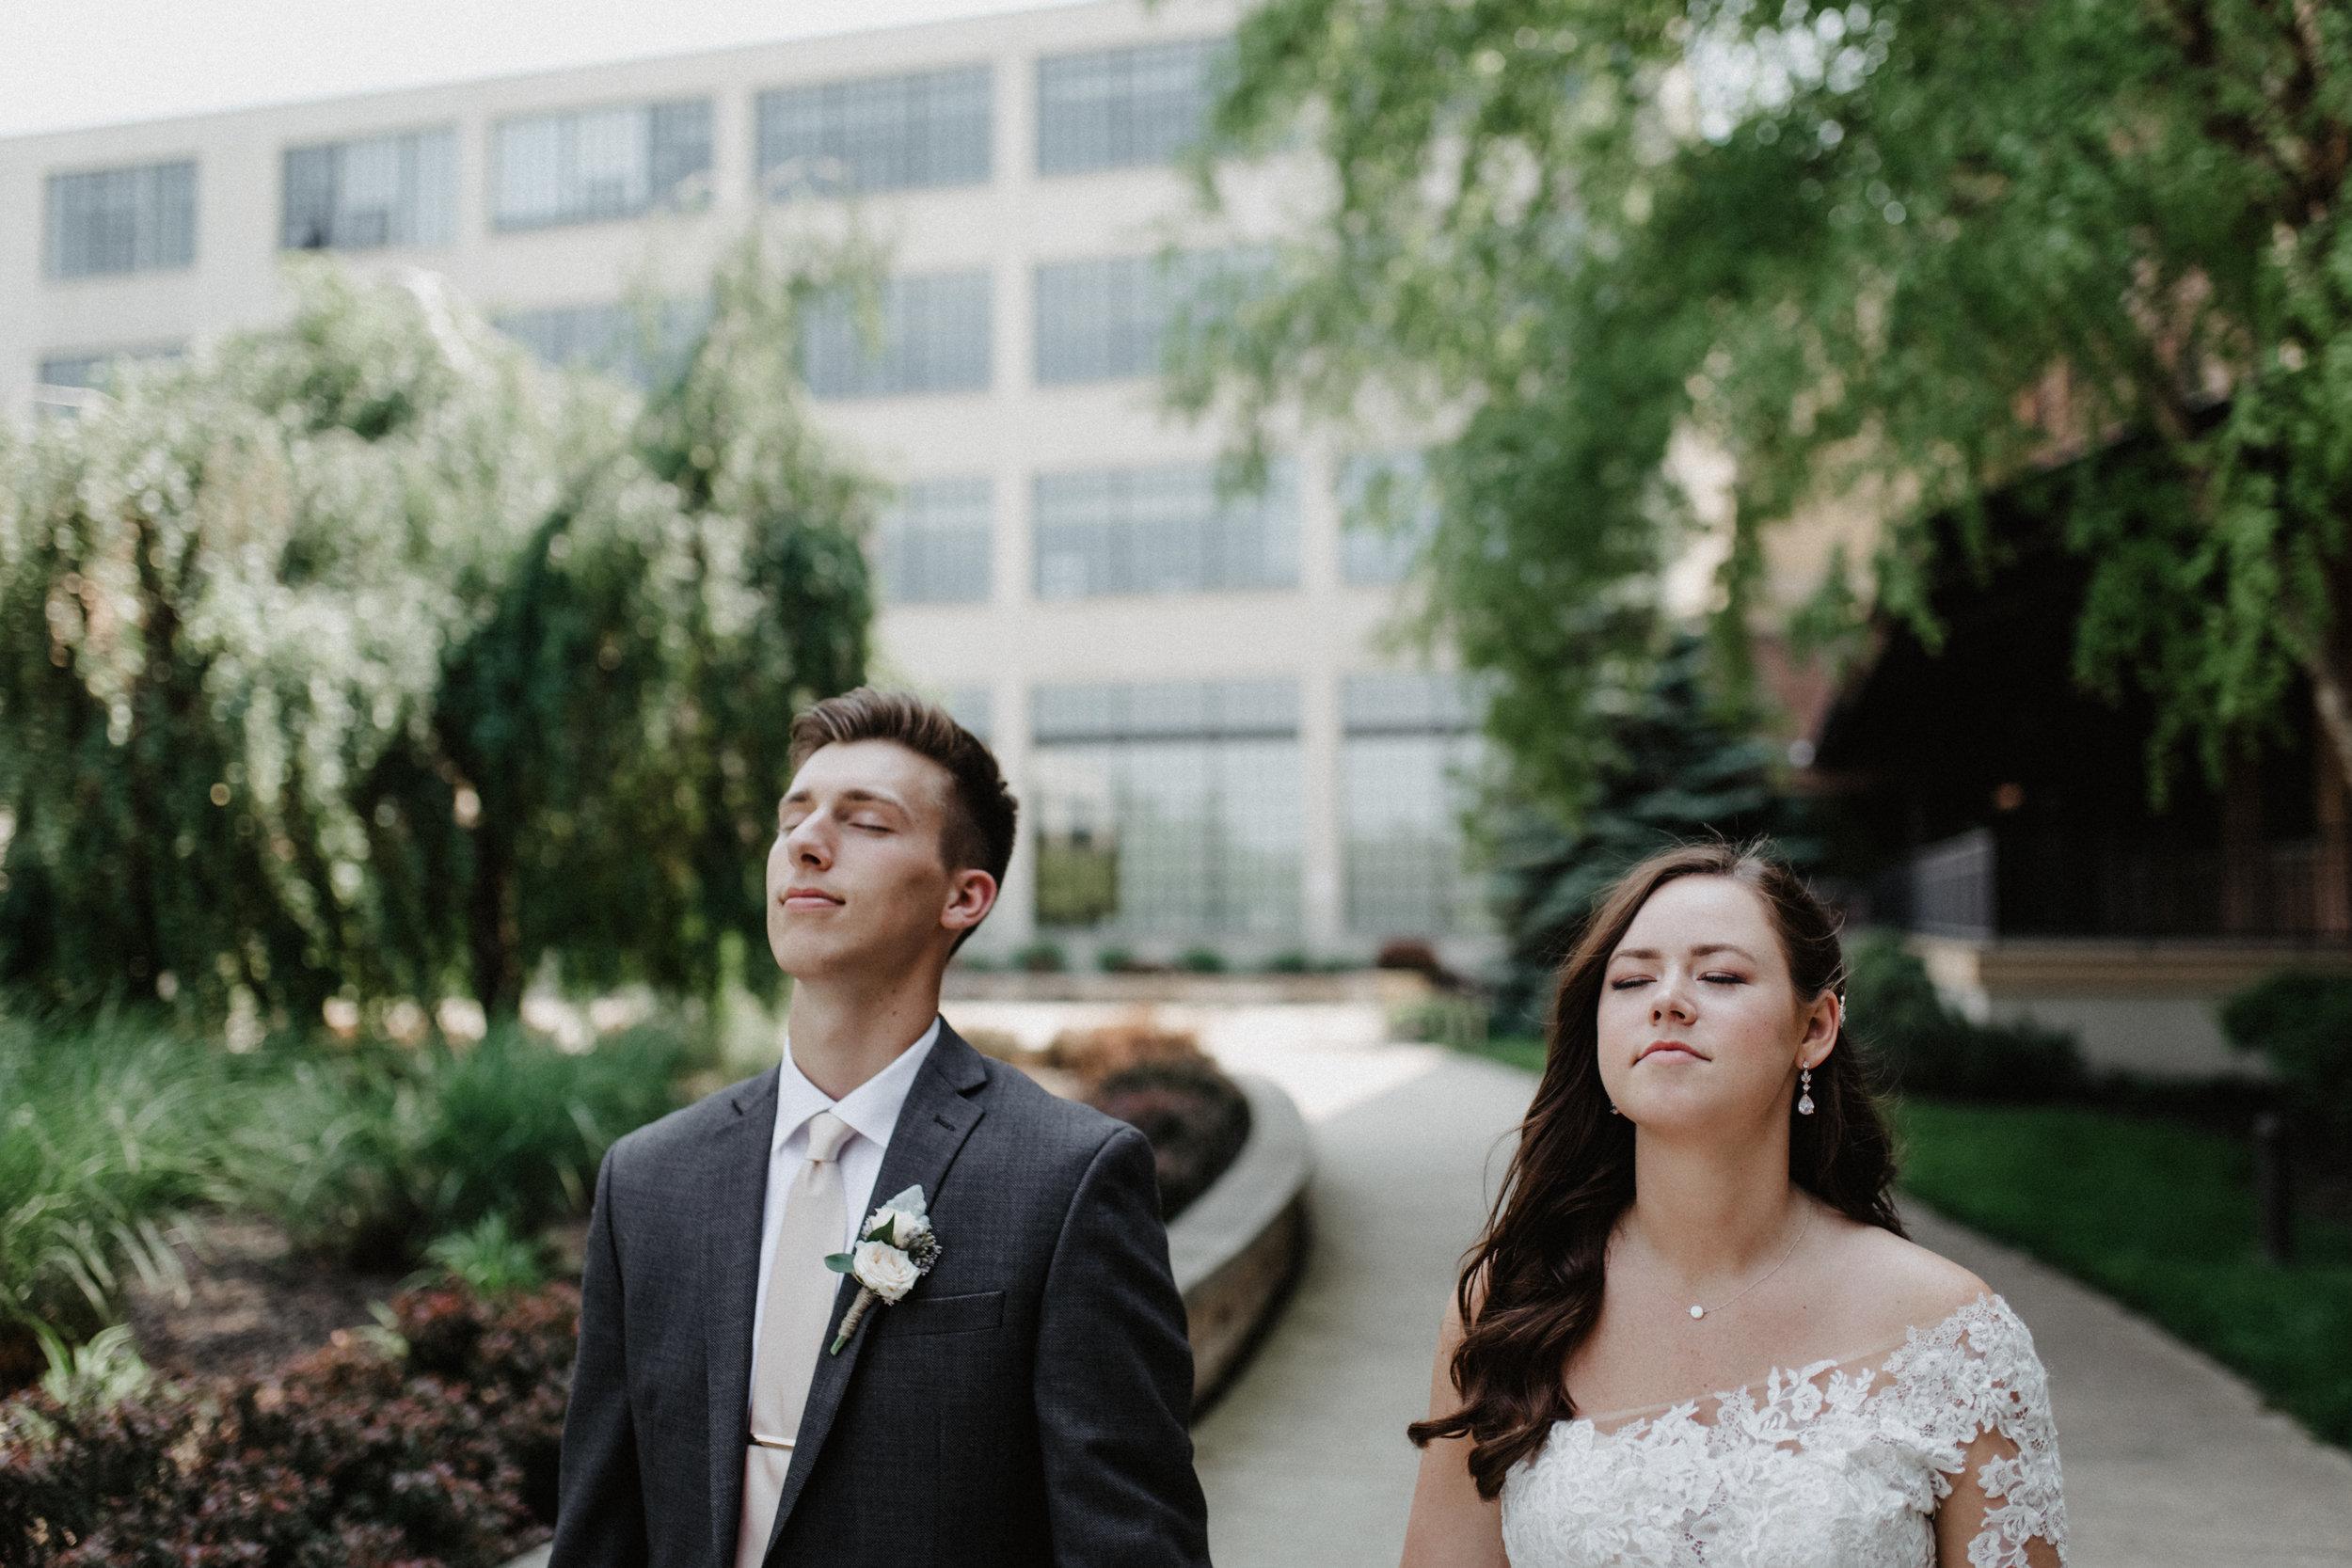 GRAYCENTOMHAMILTON-GRAND-RAPIDS-WEDDING-PHOTOGRAPHY-36.jpg